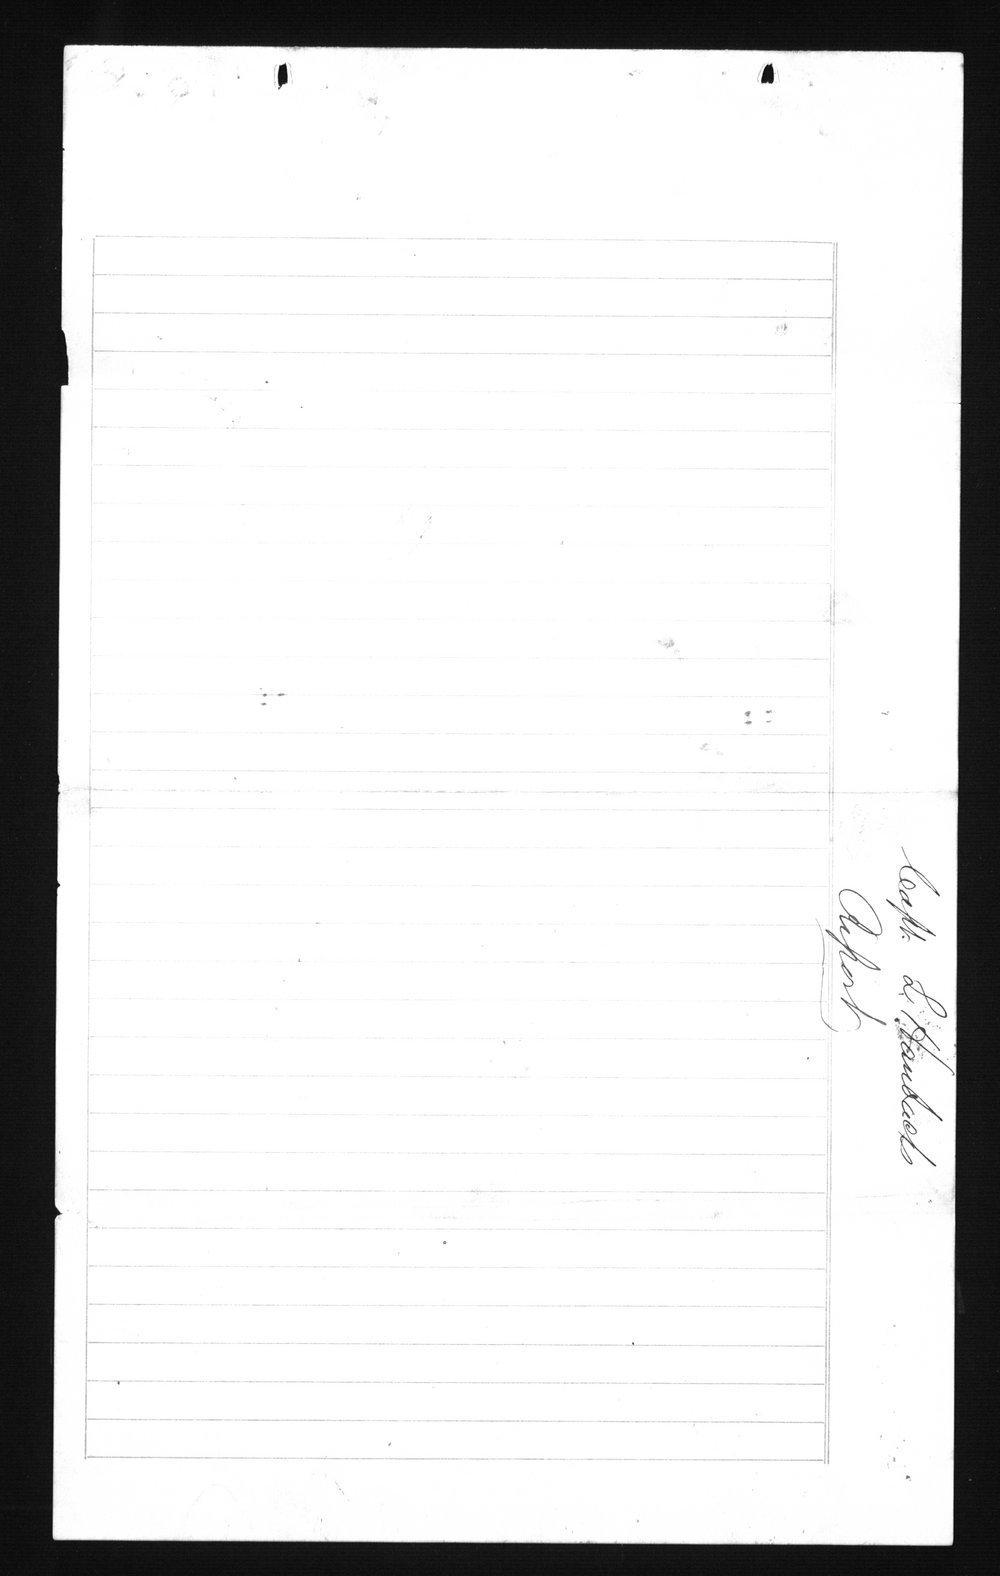 Captain Lewis Hanback's final report - cover sheet